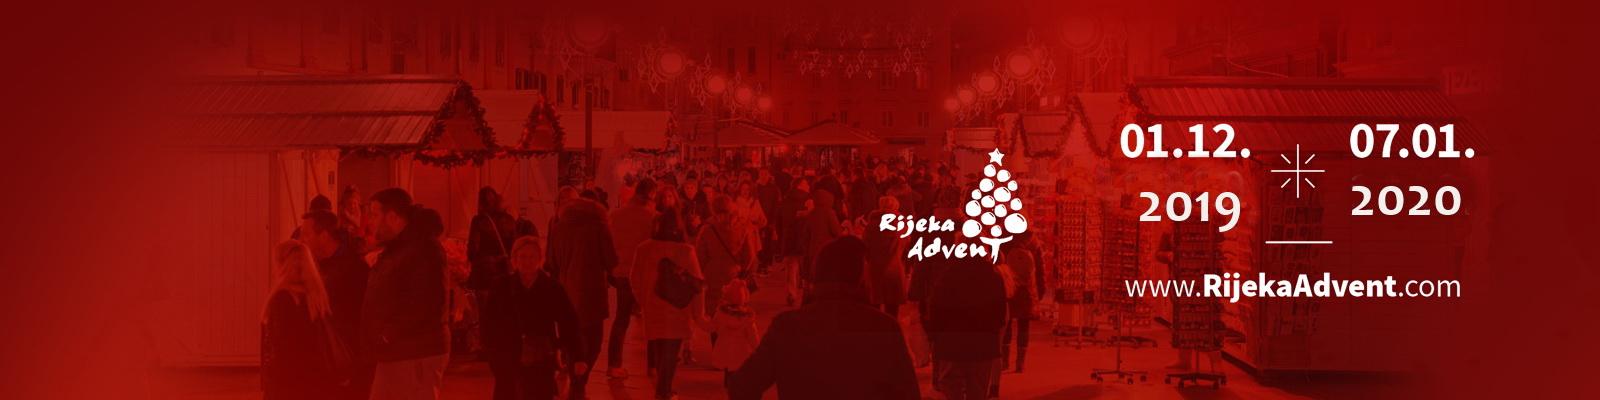 Rijeka-Advent 2019